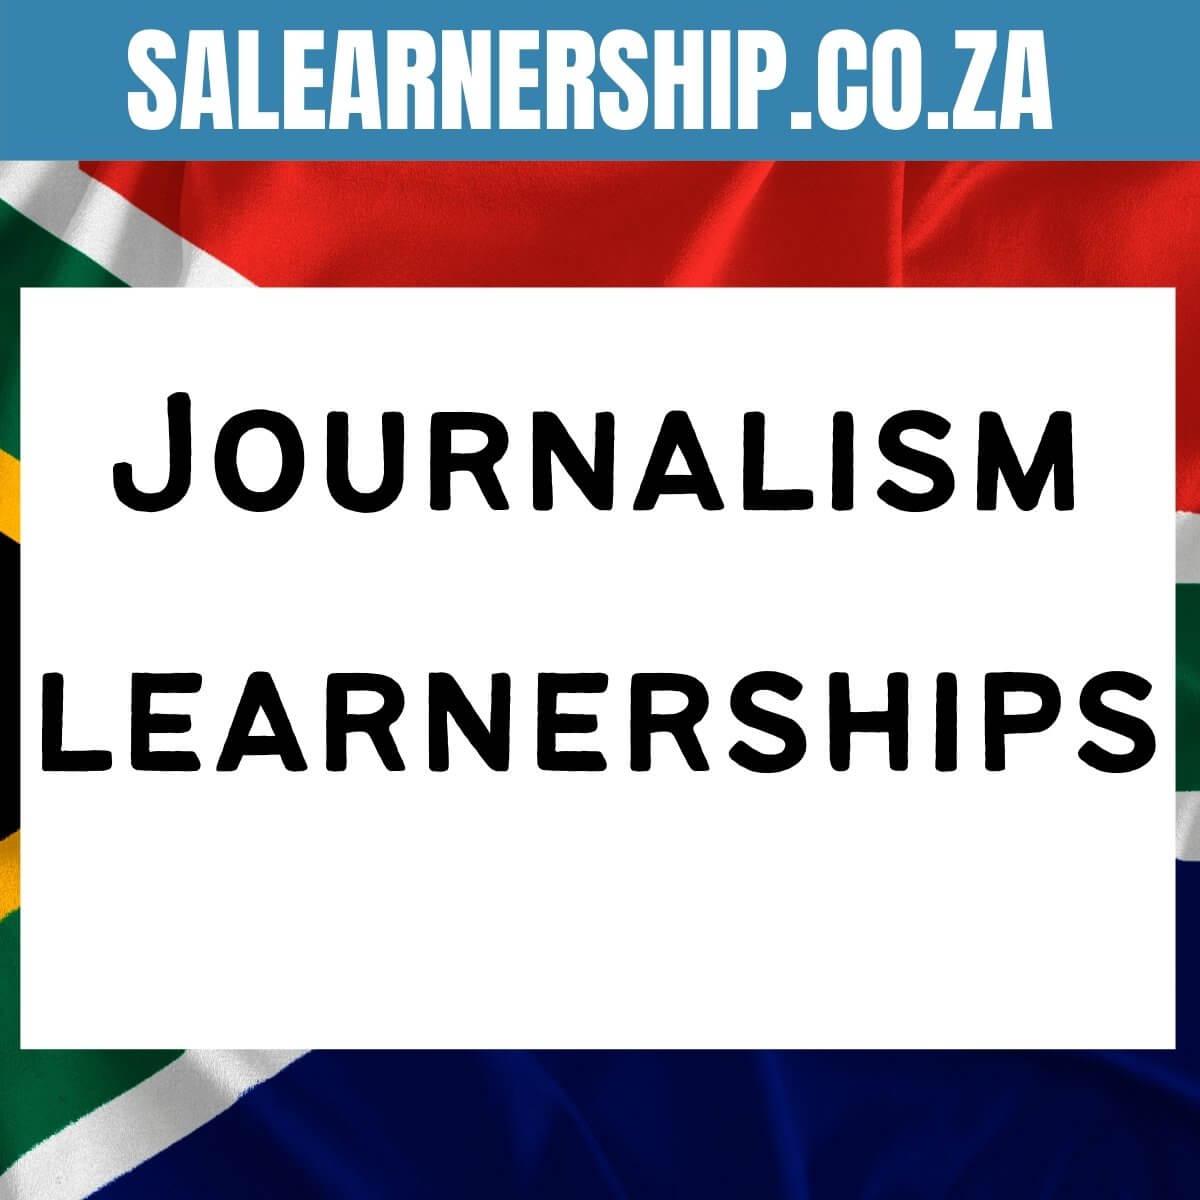 Journalism learnerships